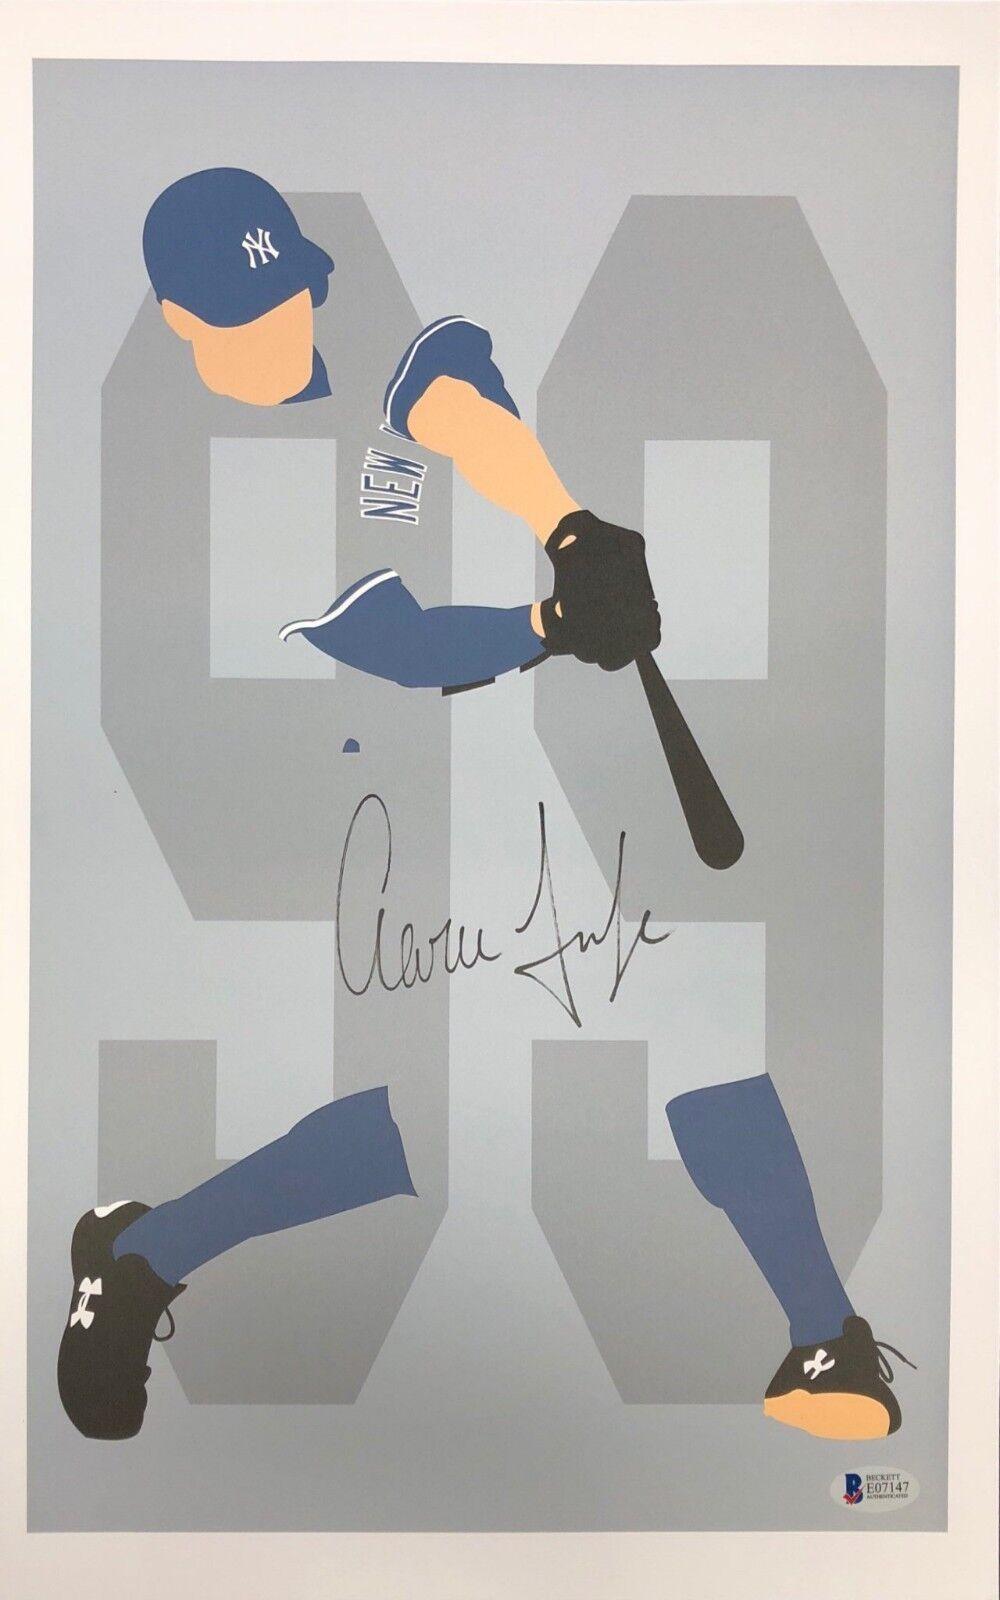 Aaron Judge Signed New York Yankees Baseball 11x17 Print BAS Beckett E07147